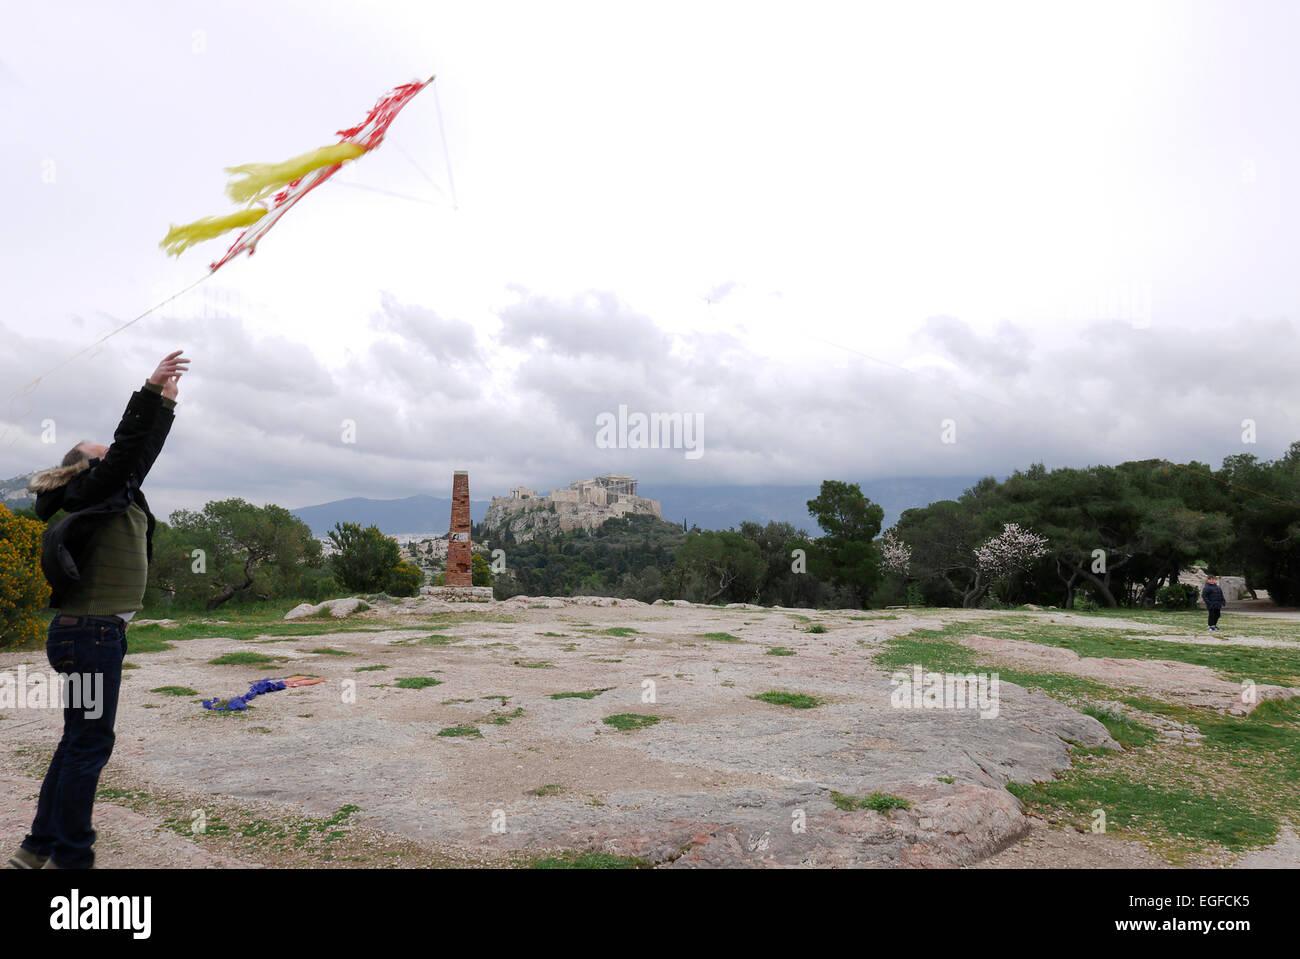 greece athens flying kites on Filopappou hill on clean monday - Stock Image